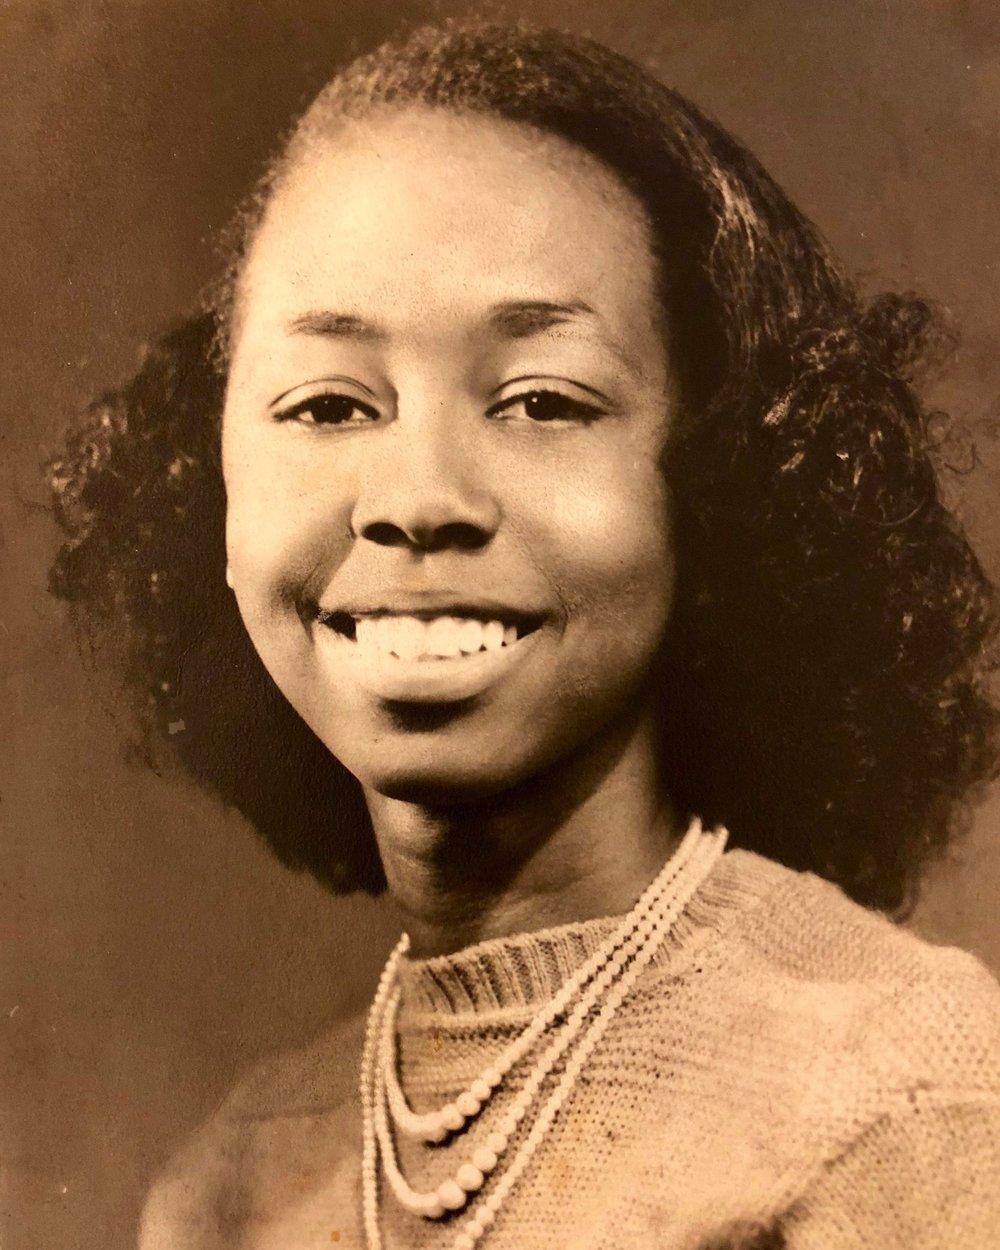 My Momma - HS Senior (Weems Jacksonville Photography Studio)